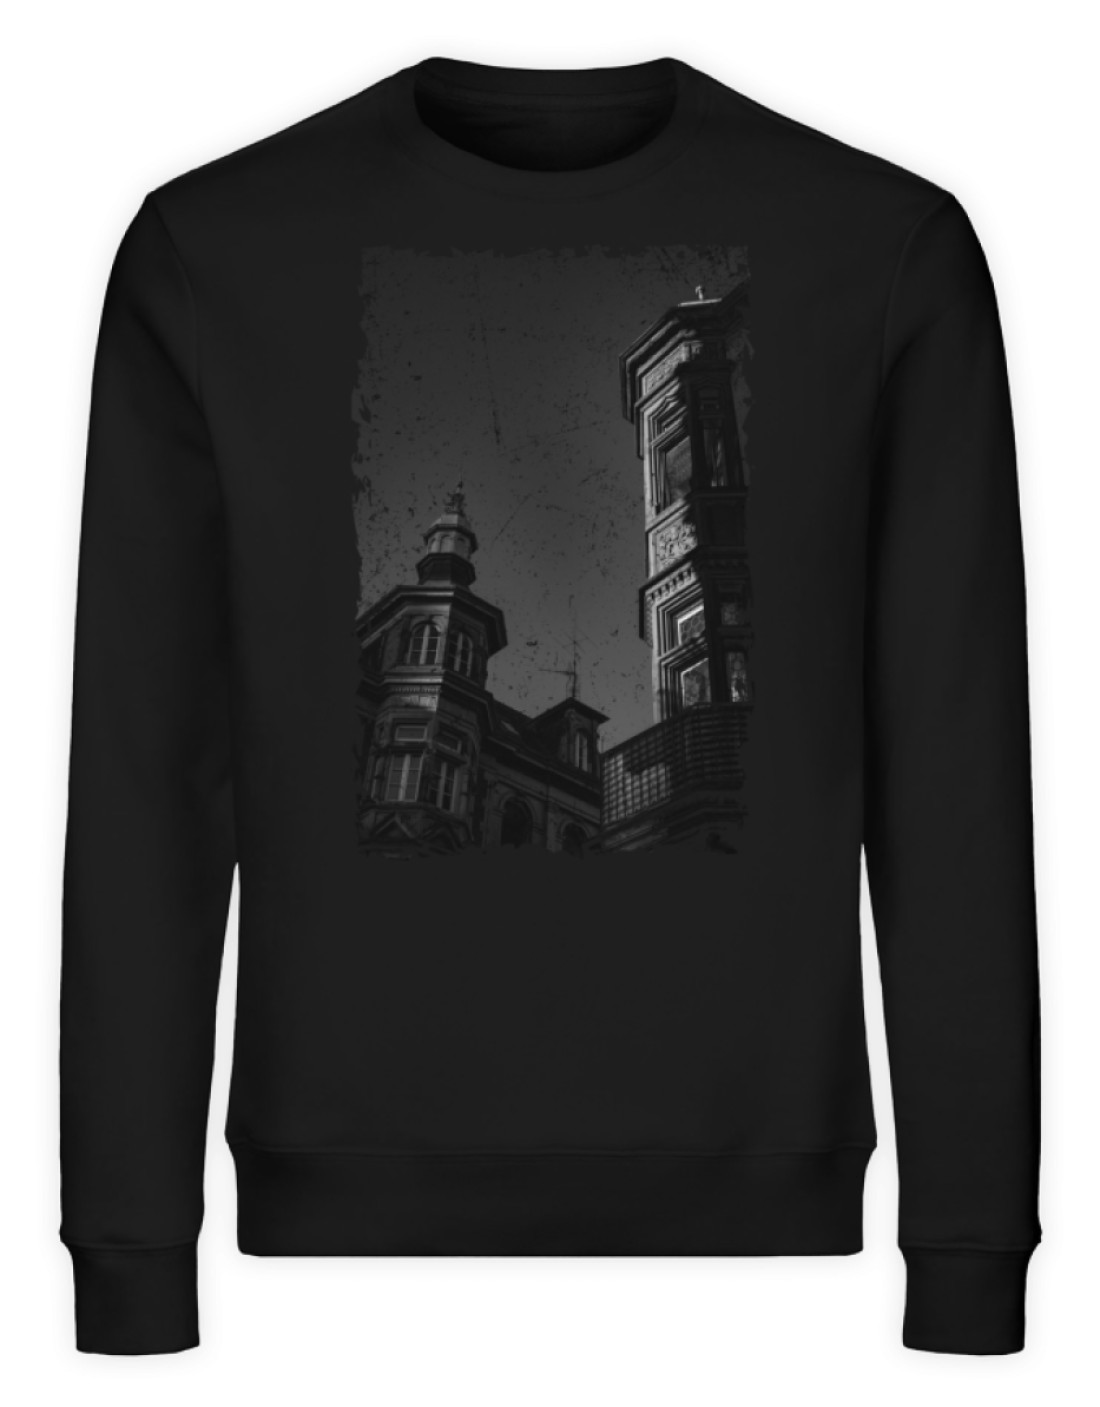 Old Town Freiburg (Unisex Premium Organic Sweatshirt ST/ST)